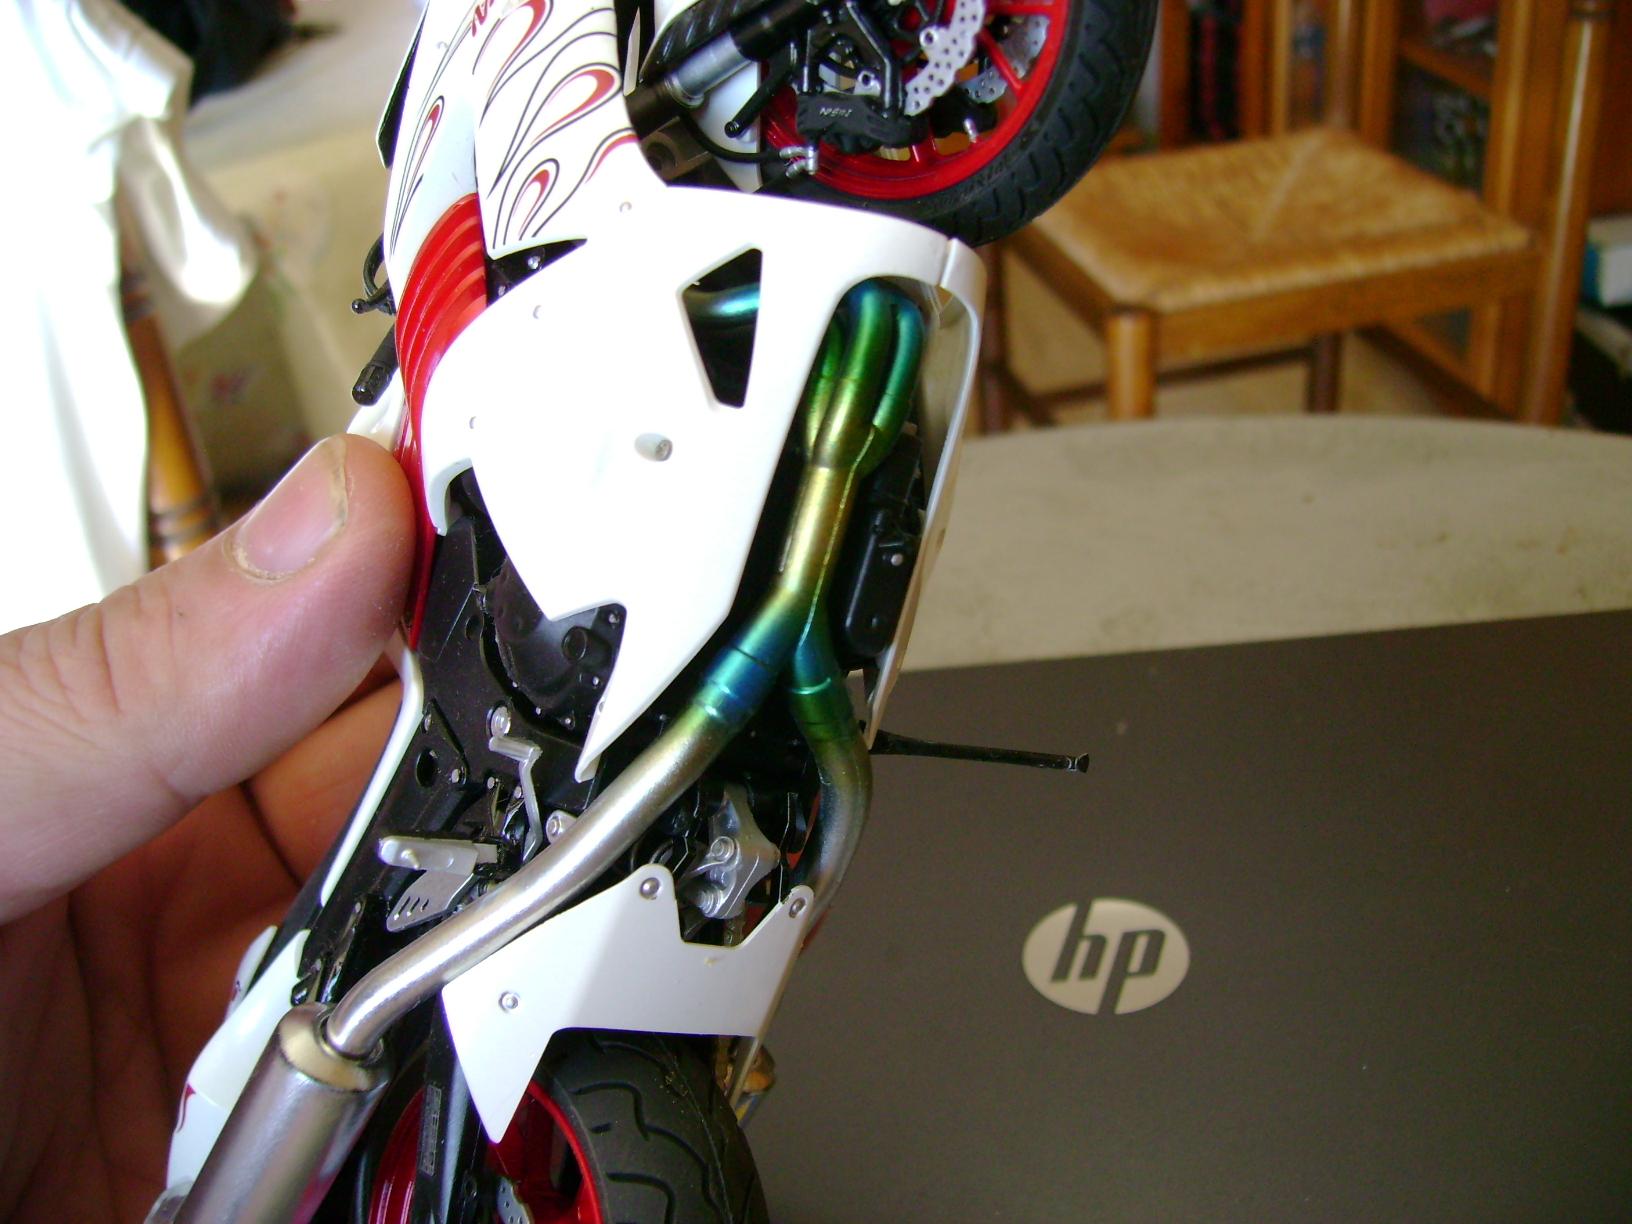 Ninja zx-14 special color edition Dsc02349a